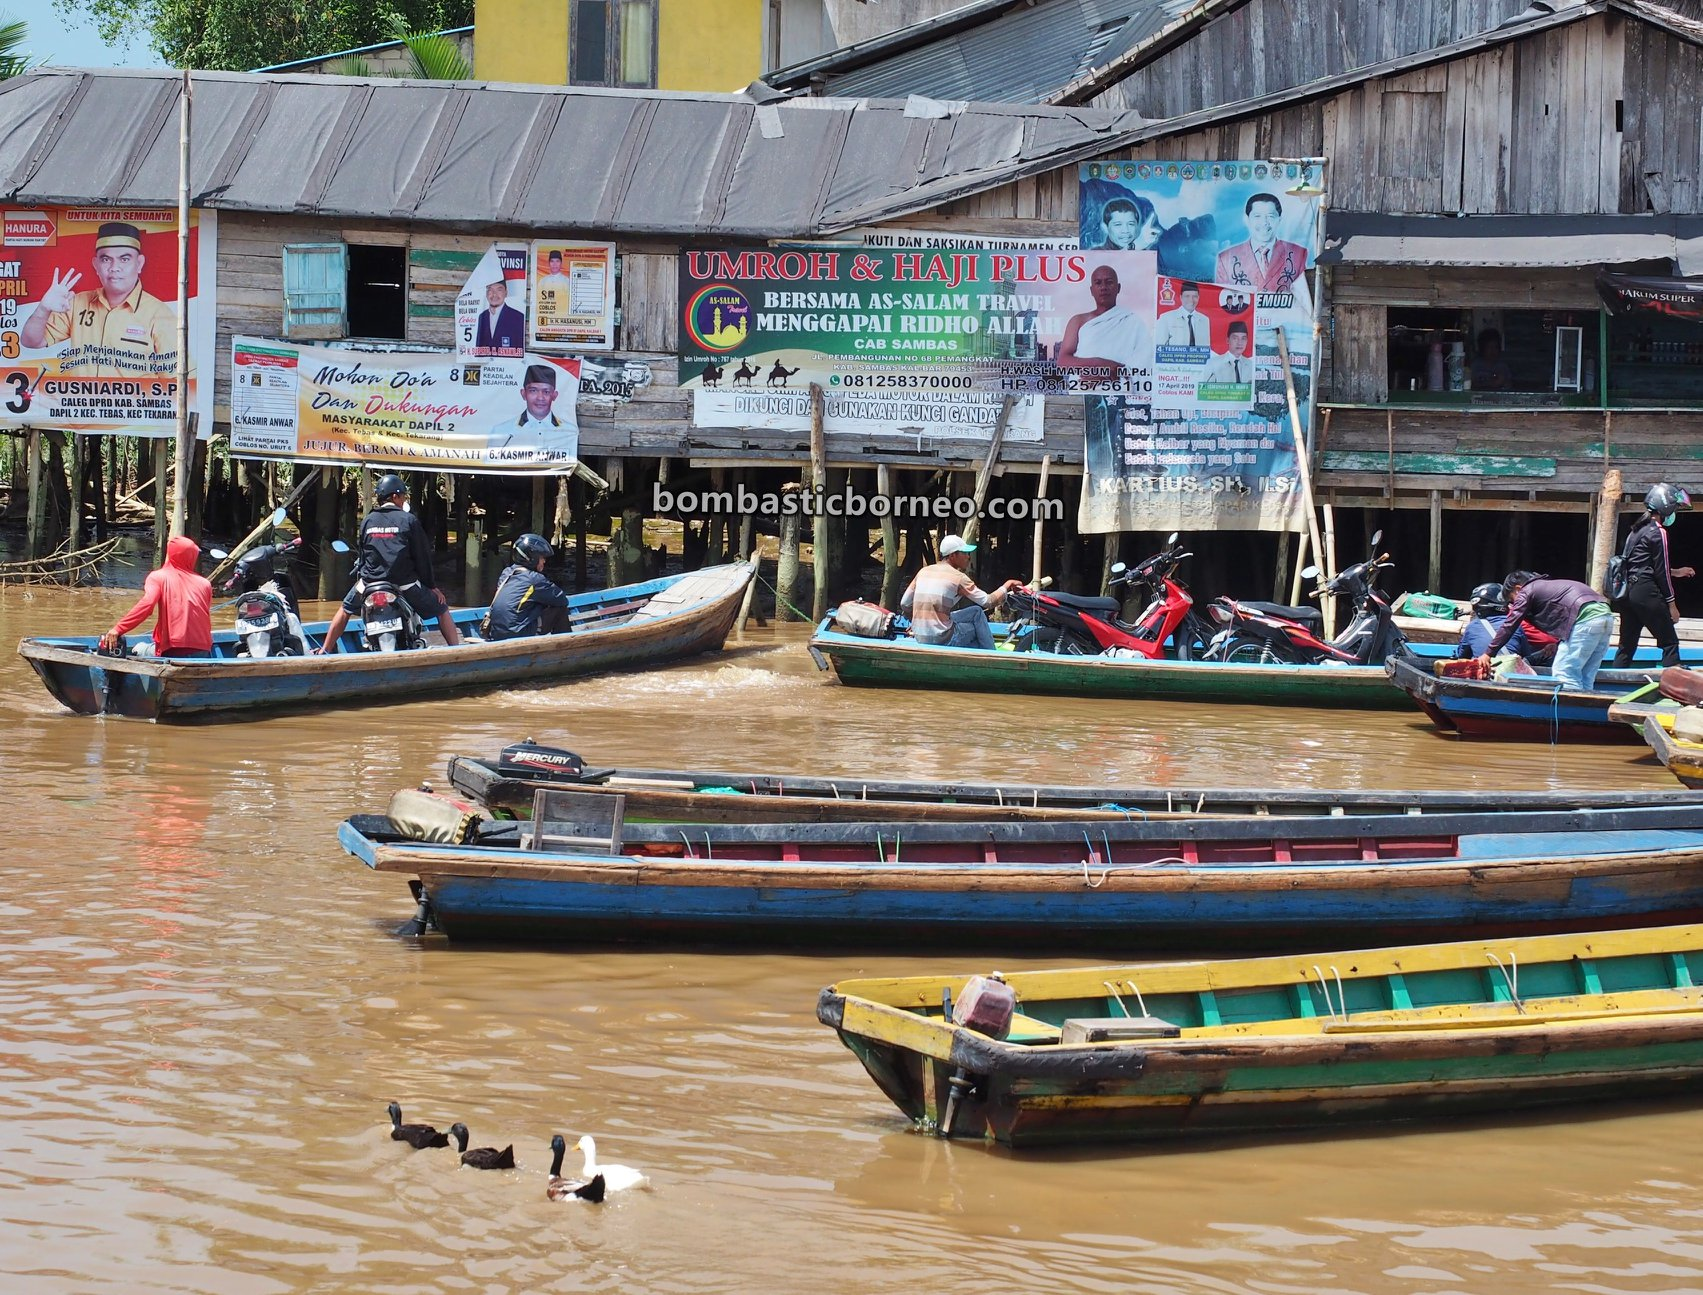 adventure, traditional, Perigi Piai Tekarang Ferry port, Malay fishing village, Kampung Nelayan Melayu, Sambas, Indonesia, Jawai Selatan, Tourism, travel guide, Borneo, Trans Border, 探索婆罗洲游踪, 印尼西加里曼丹, 三发马来渔村